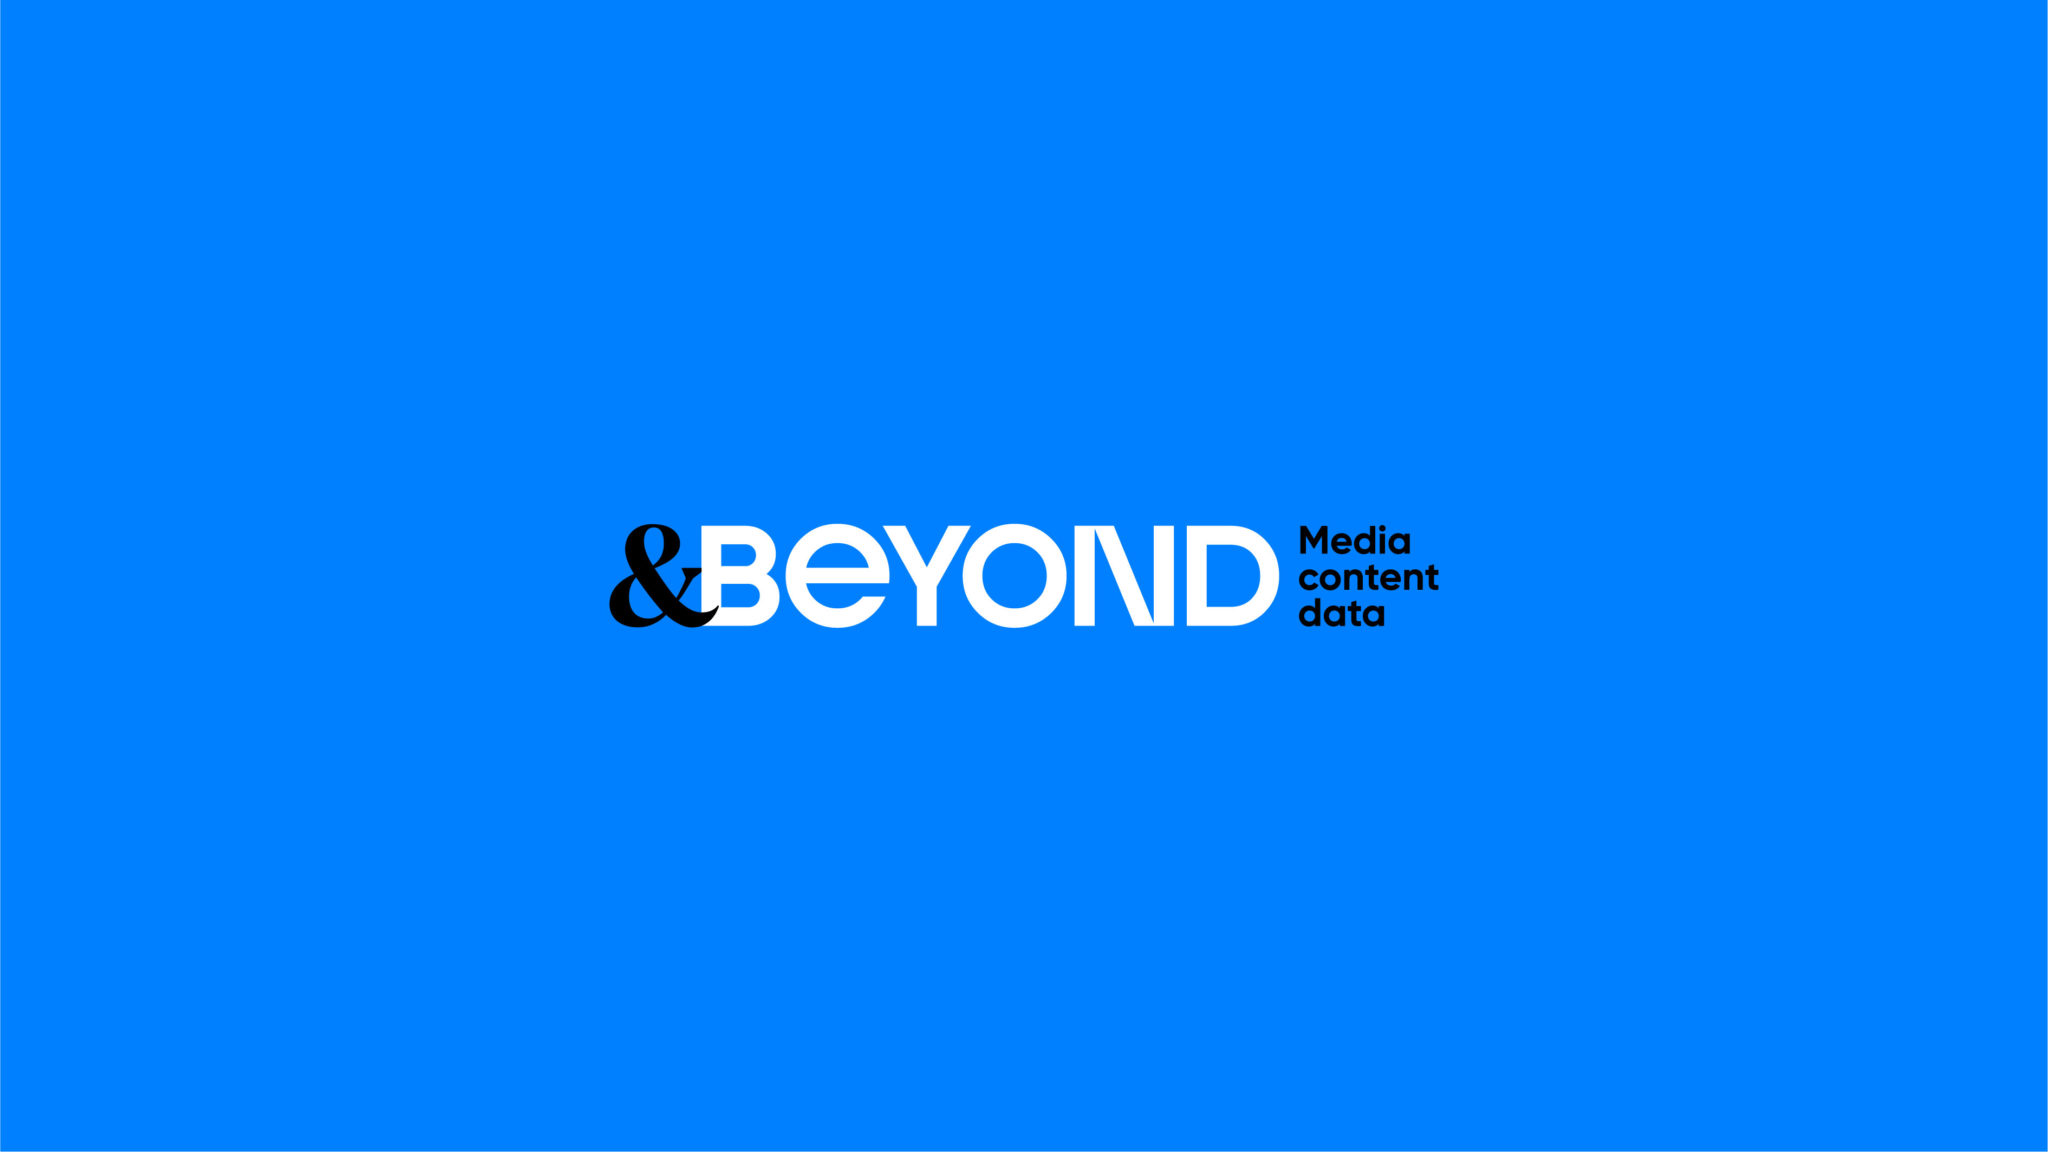 &beyond logo